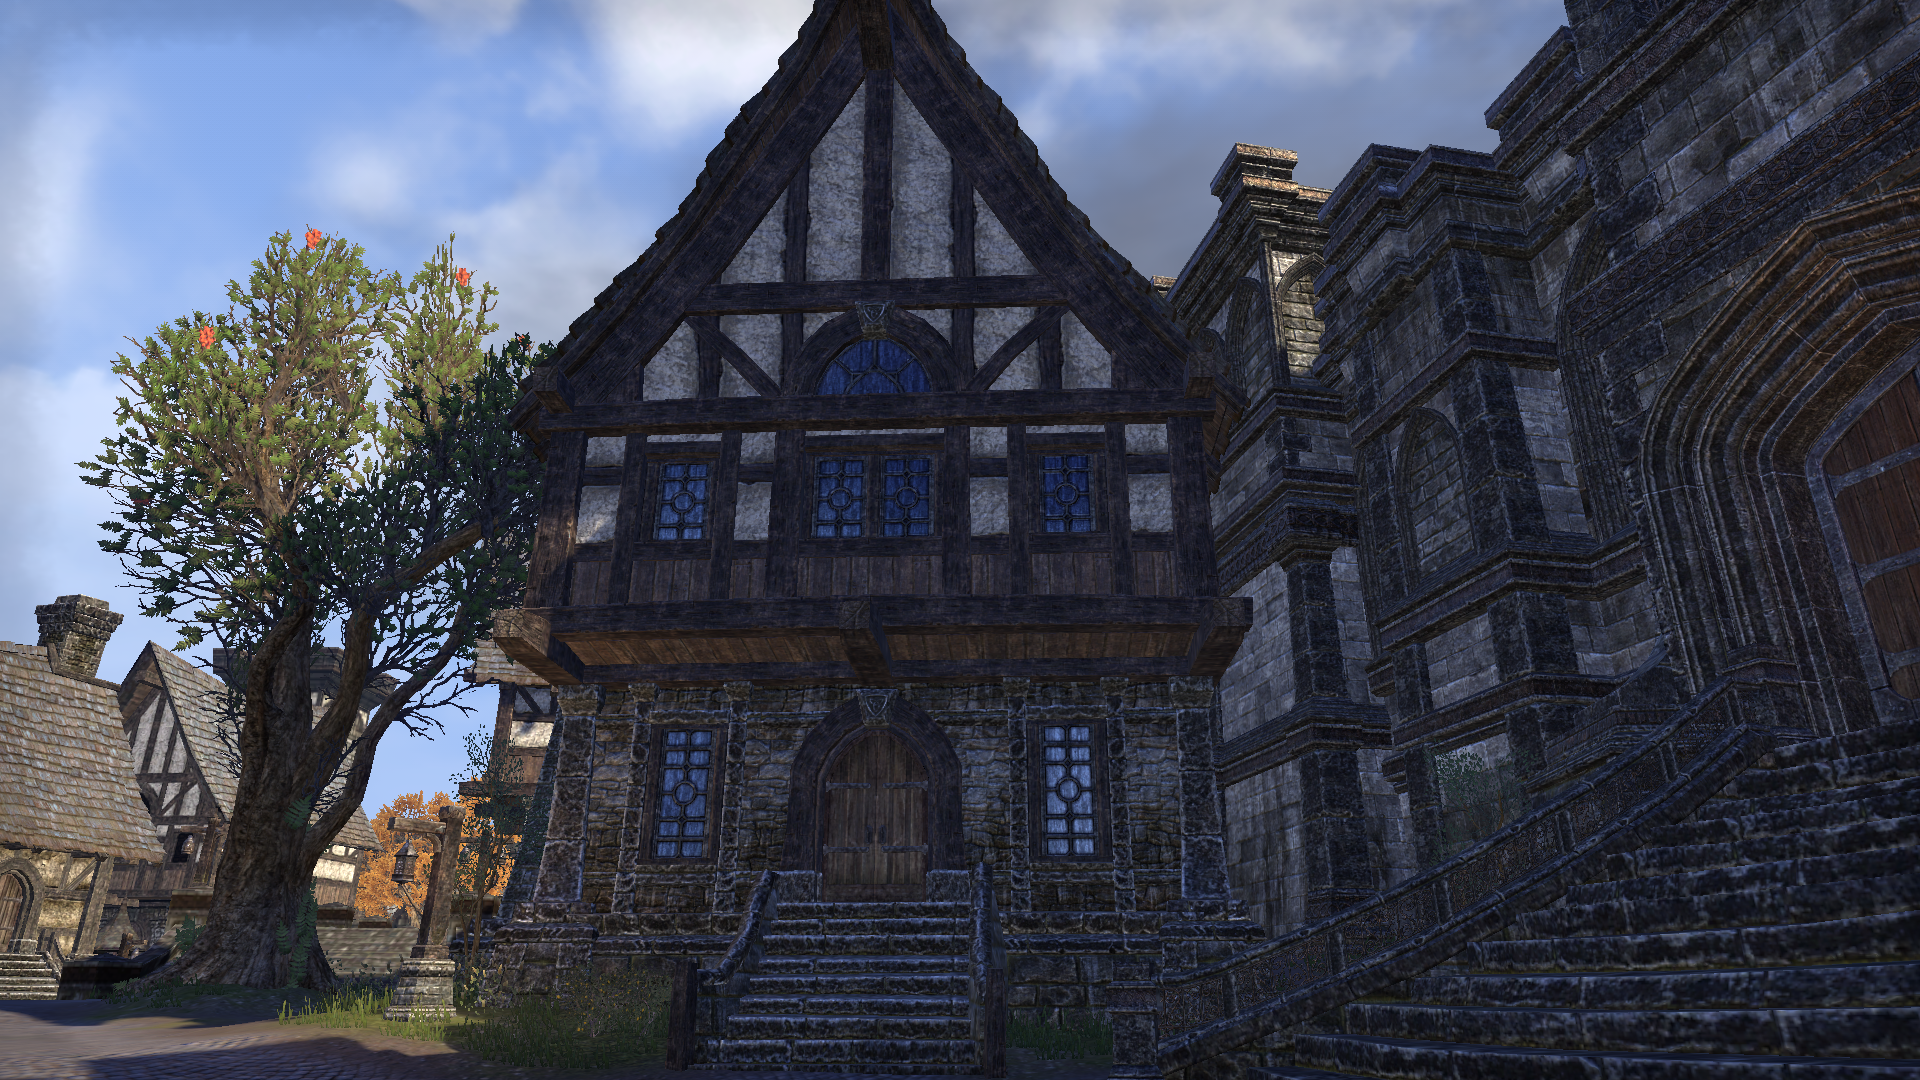 Praldyn's Home